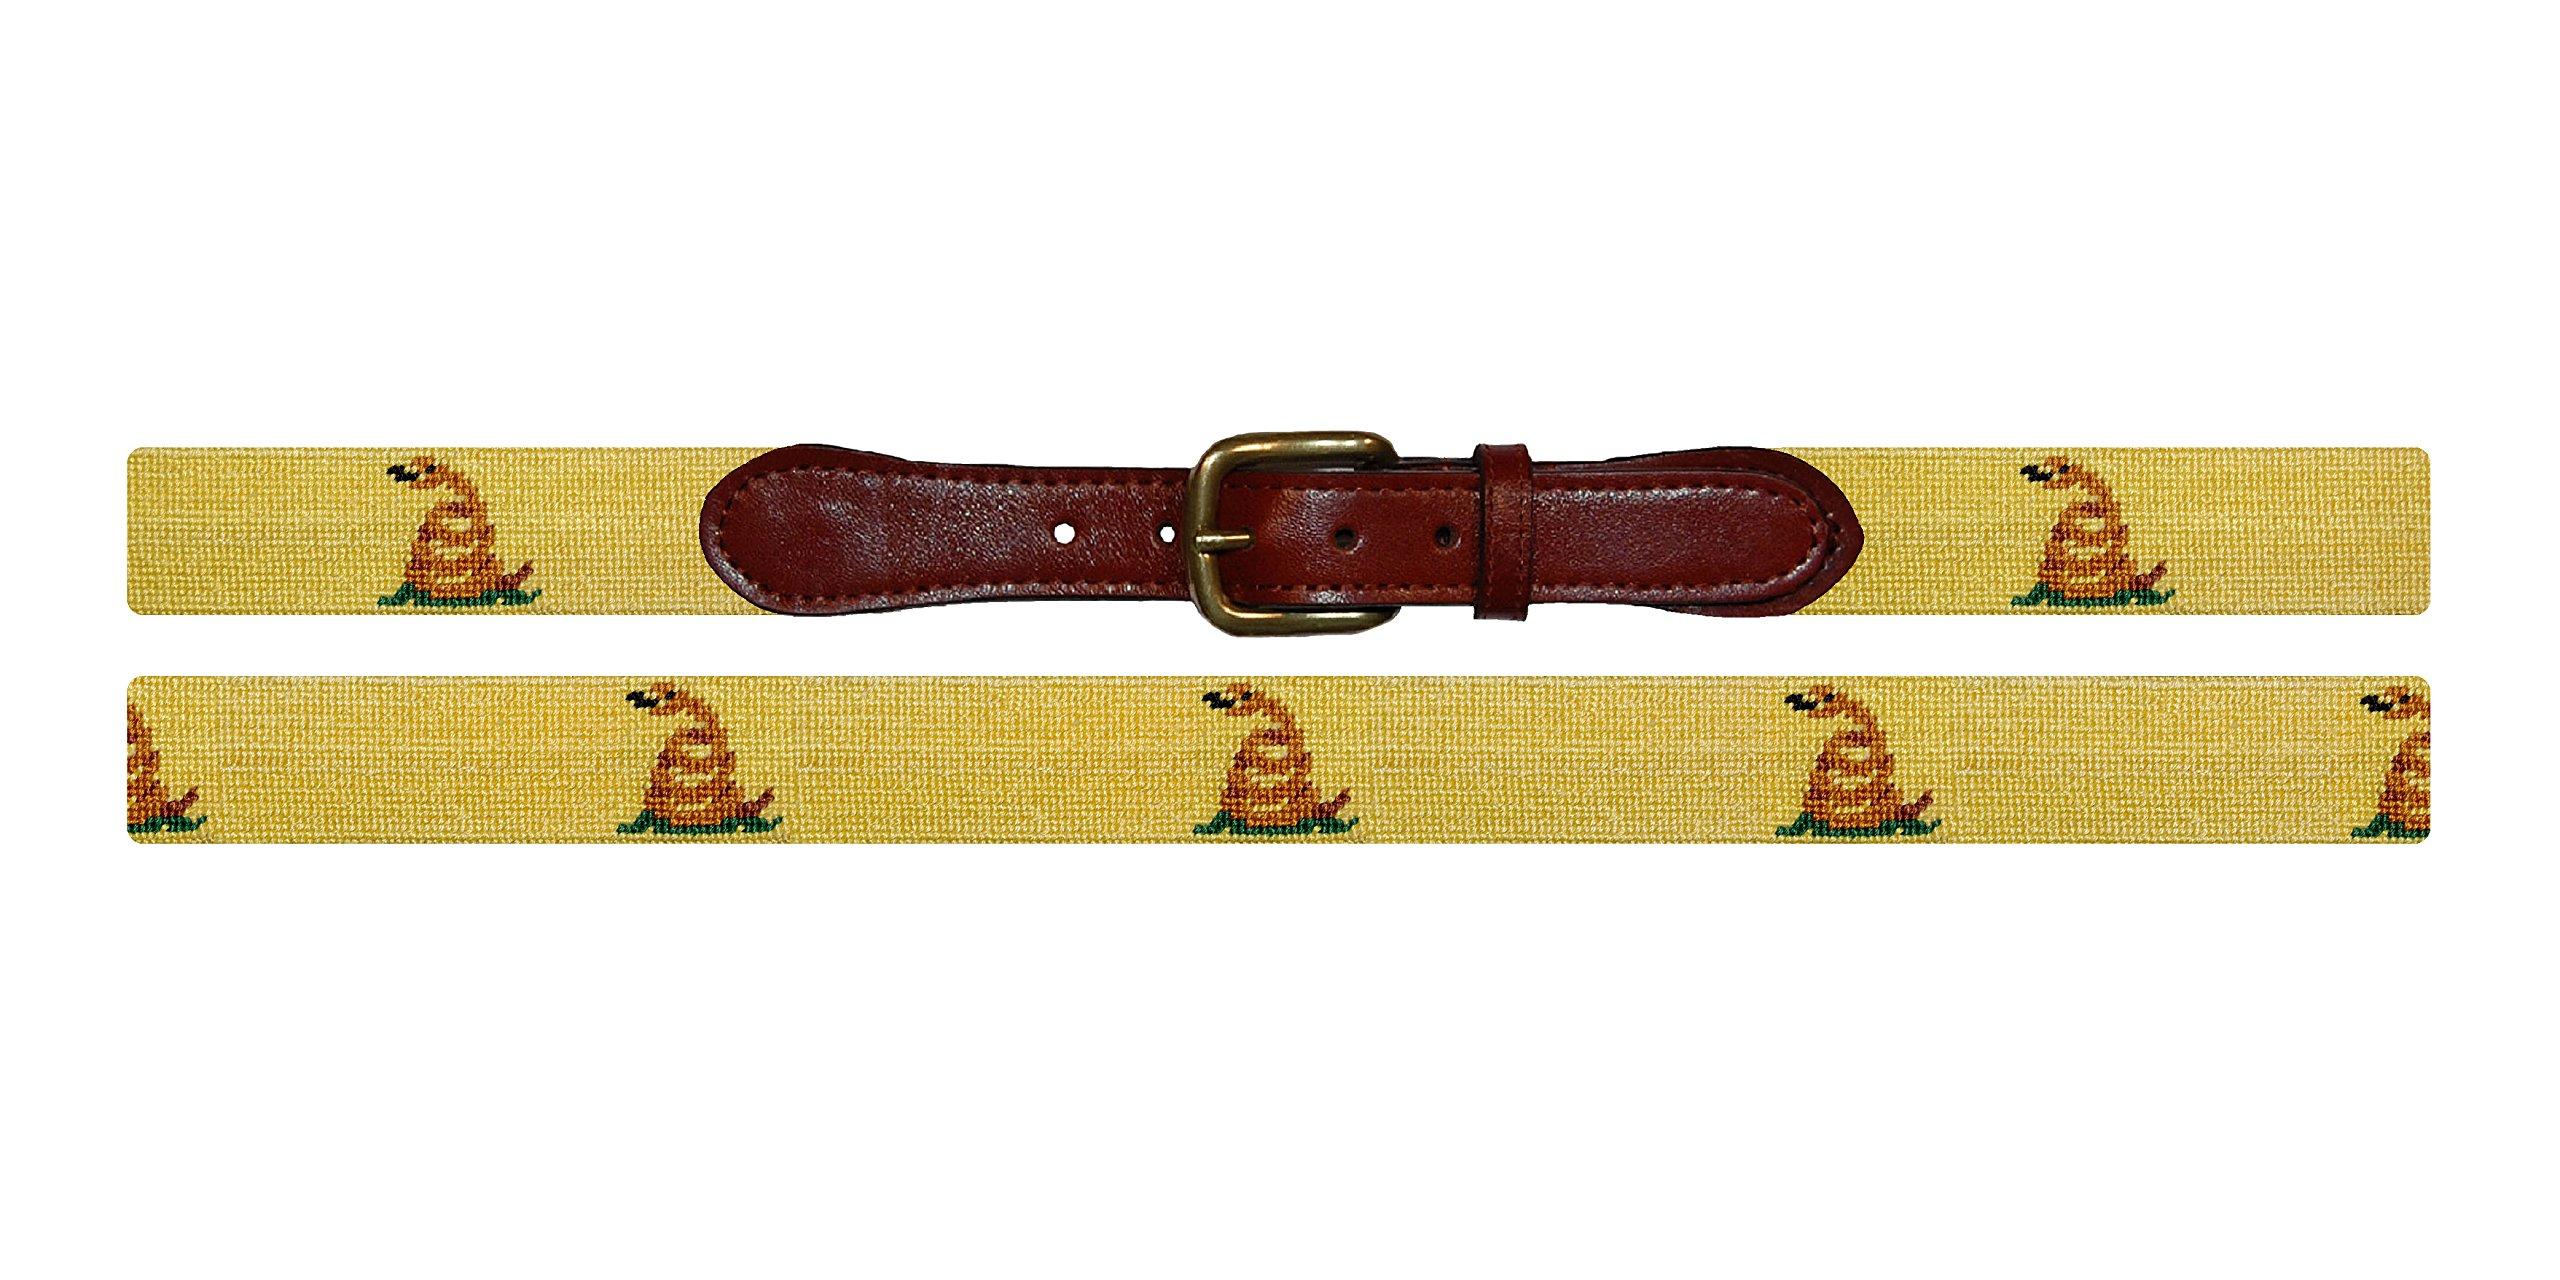 Smathers & Branson Gadsden Flag Traditional Needlepoint Belt, Size 40 (B-248-40)